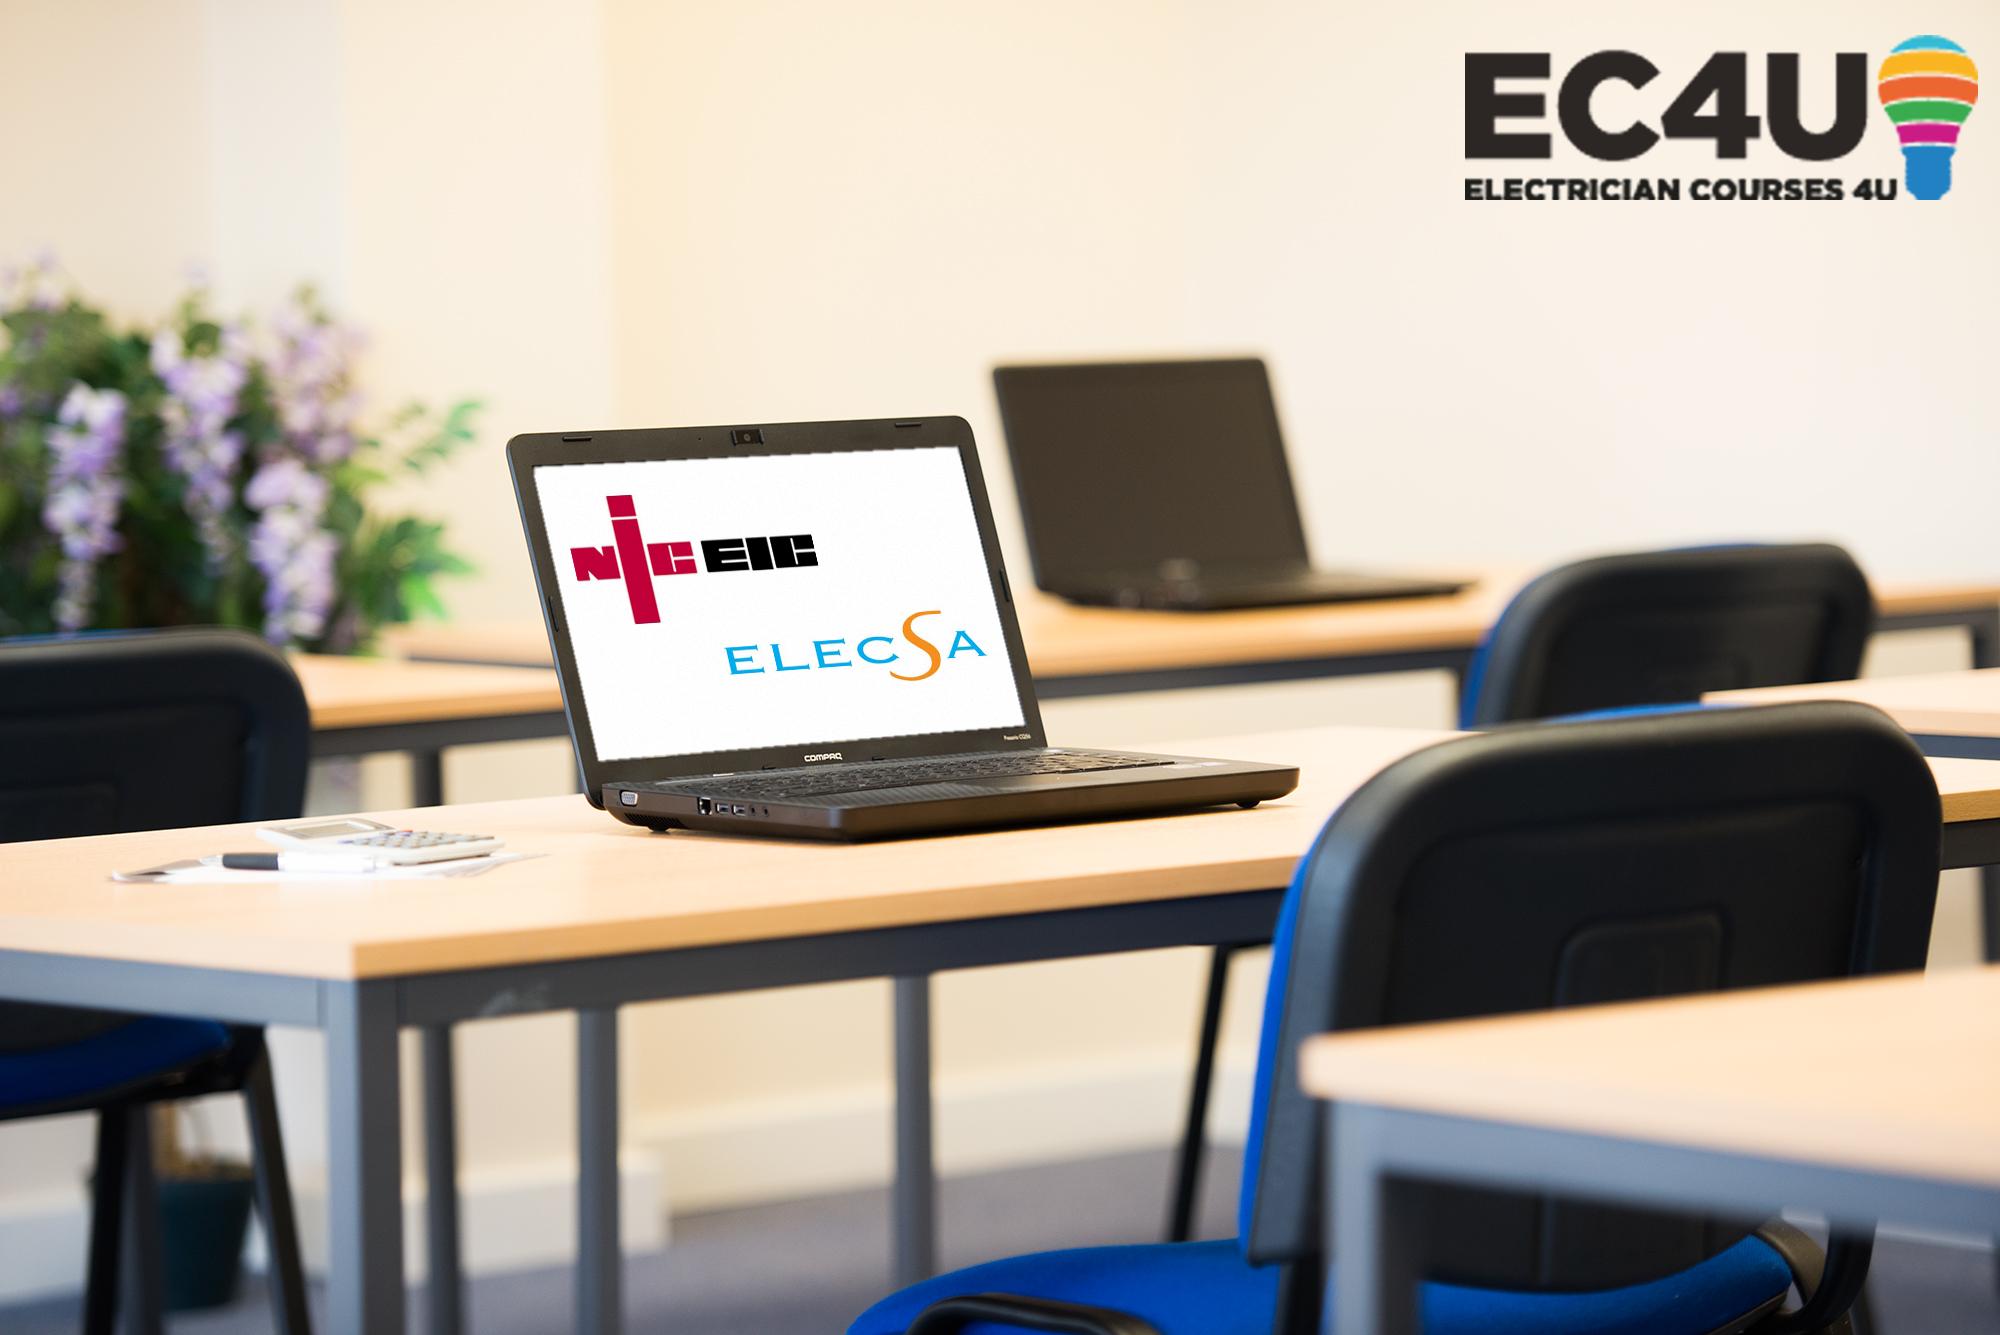 NICEIC ELECSA PARTNERSHIP WITH EC4U